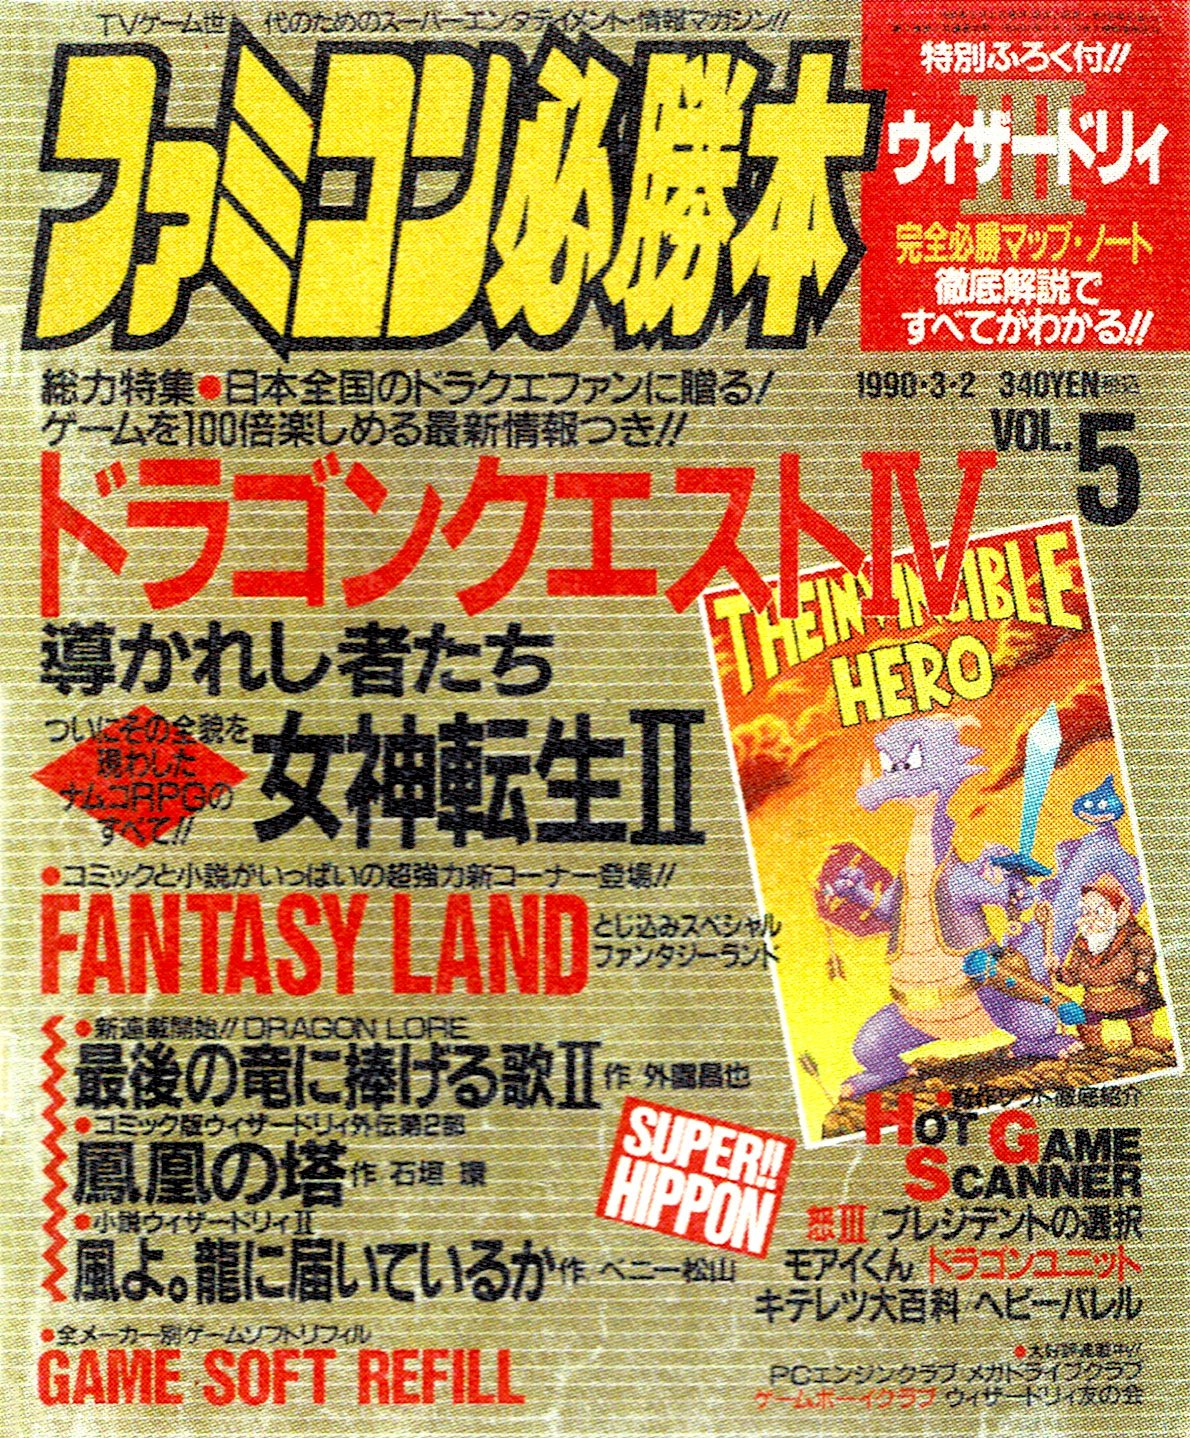 Famicom Hisshoubon Issue 090 (March 2, 1990)